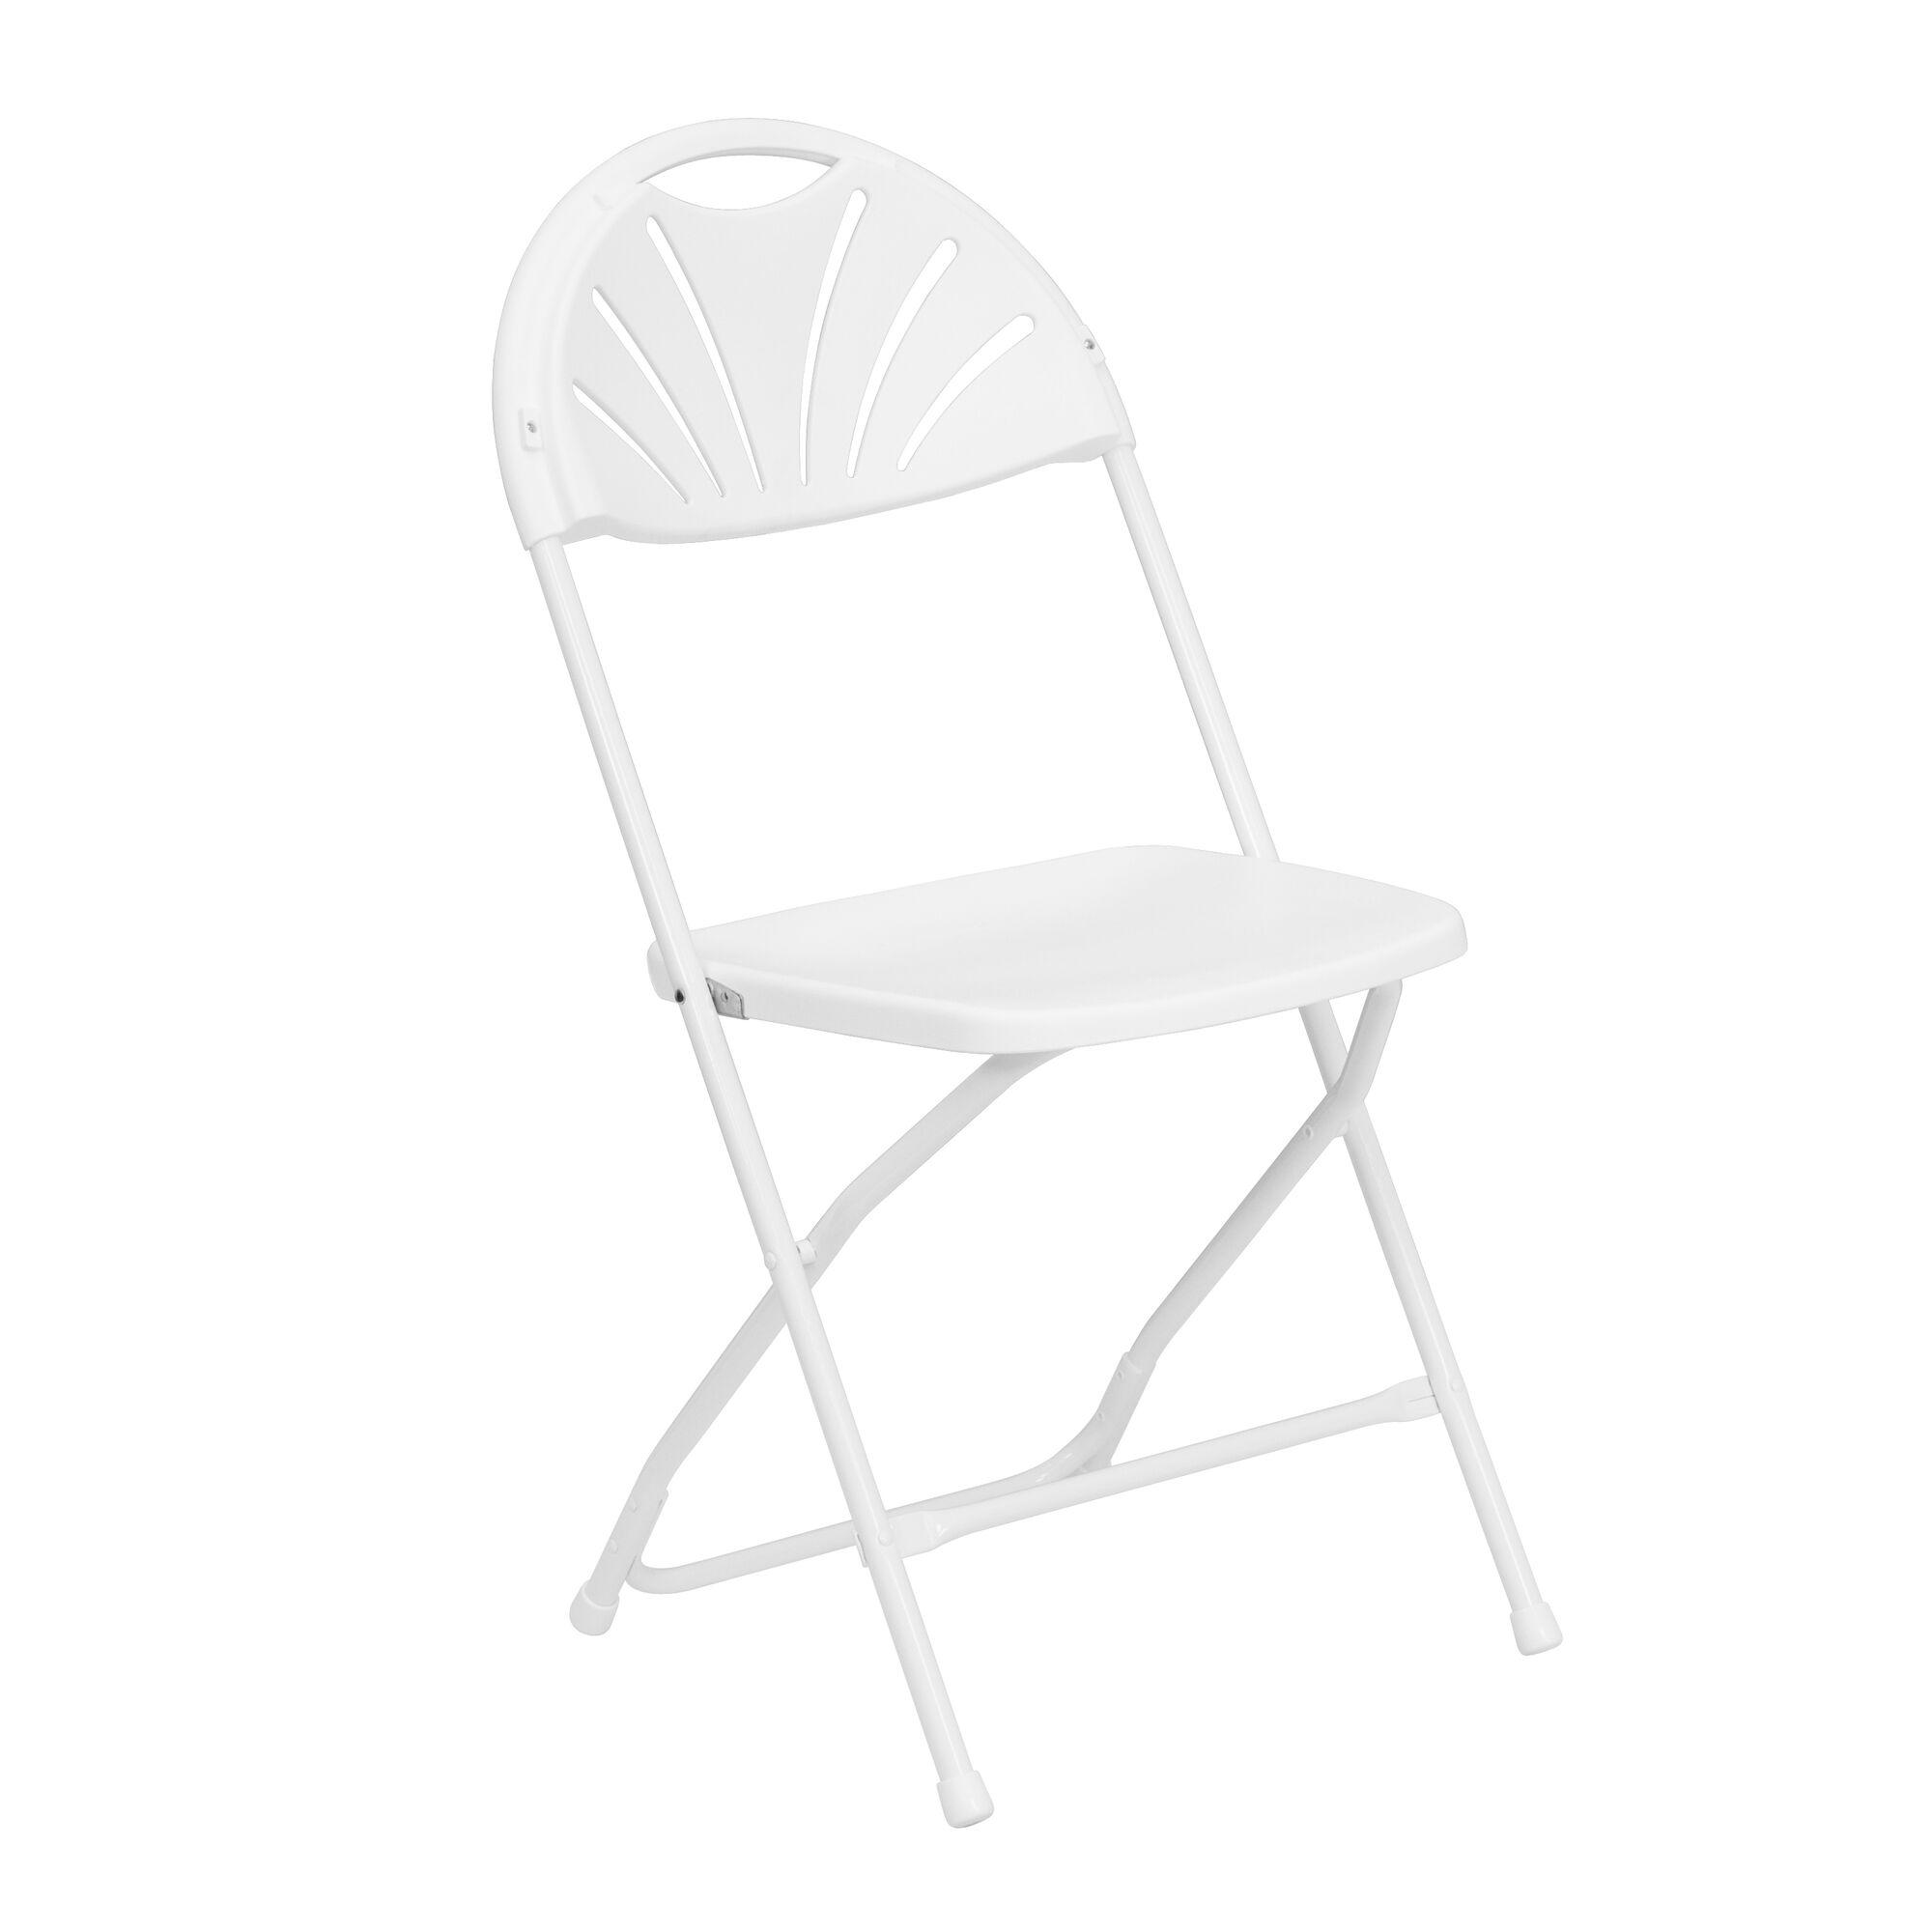 White Plastic Folding Chair Le L 4 White Gg